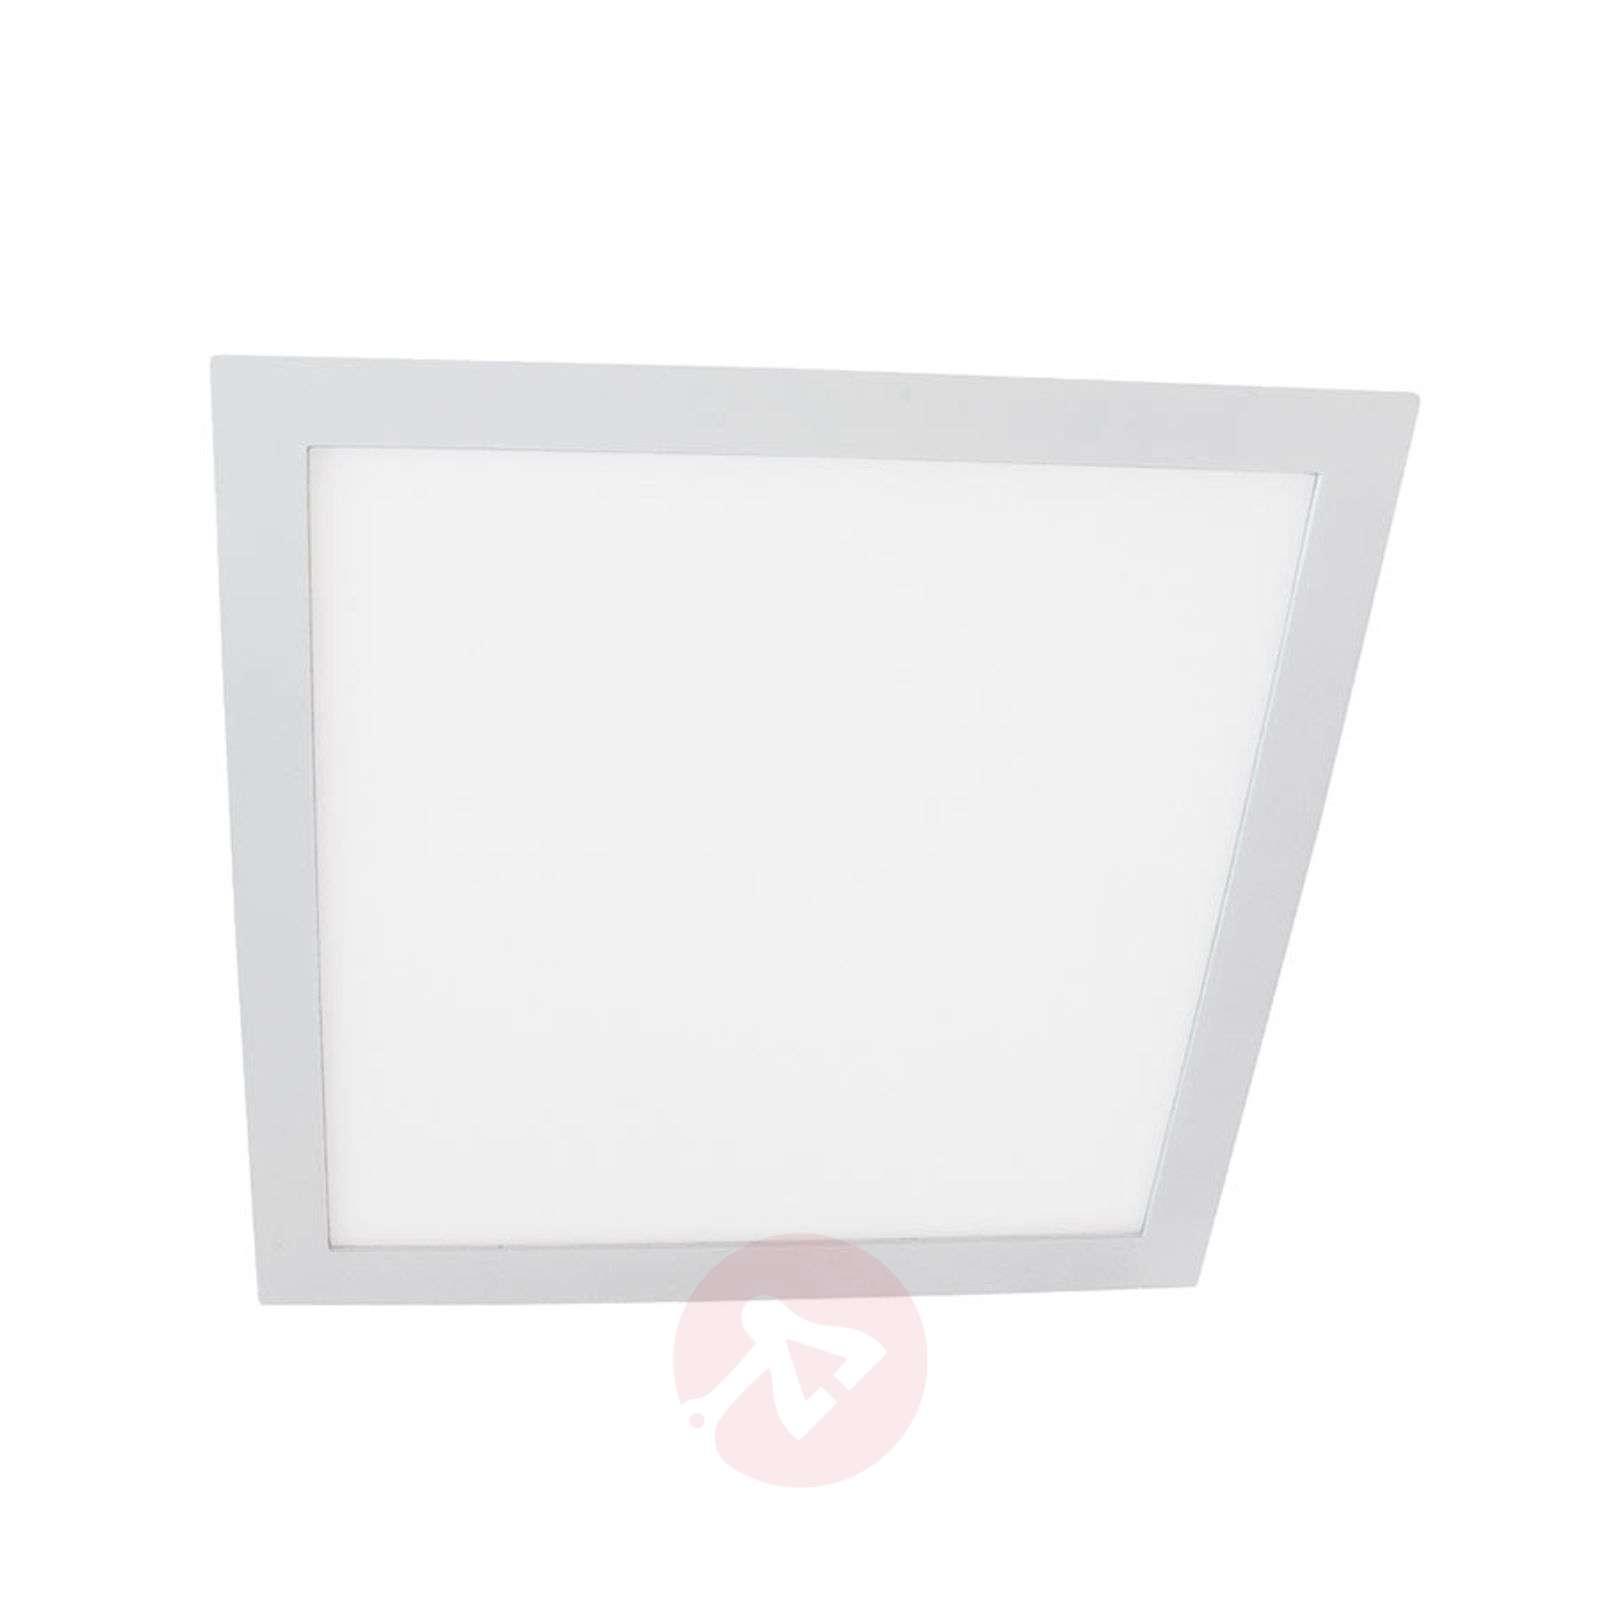 LED-uppovalo Momon Square 12W-6523752X-01